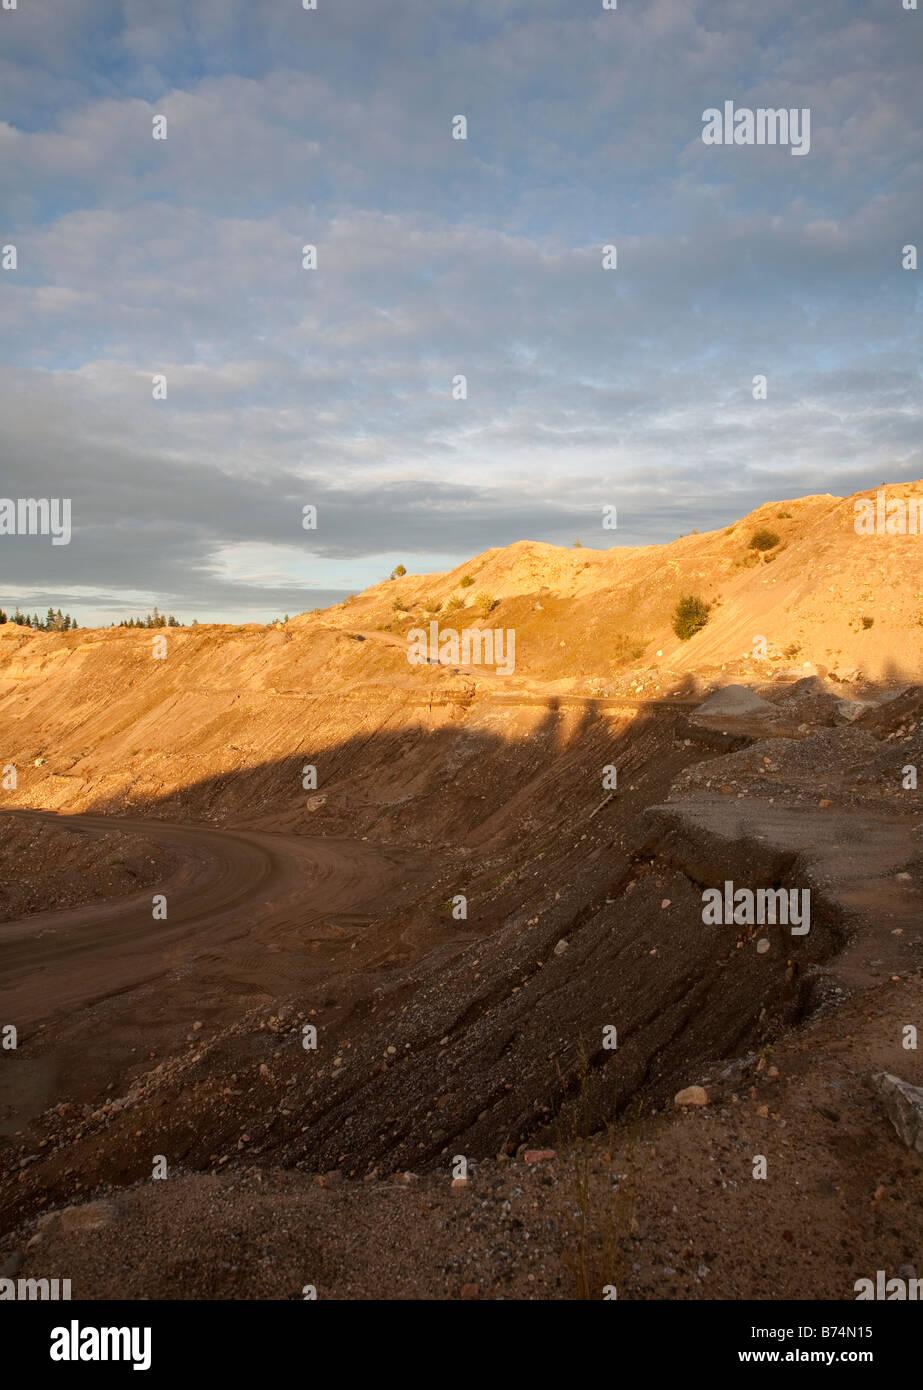 Gravel pit wall on a sandy ridge - Stock Image